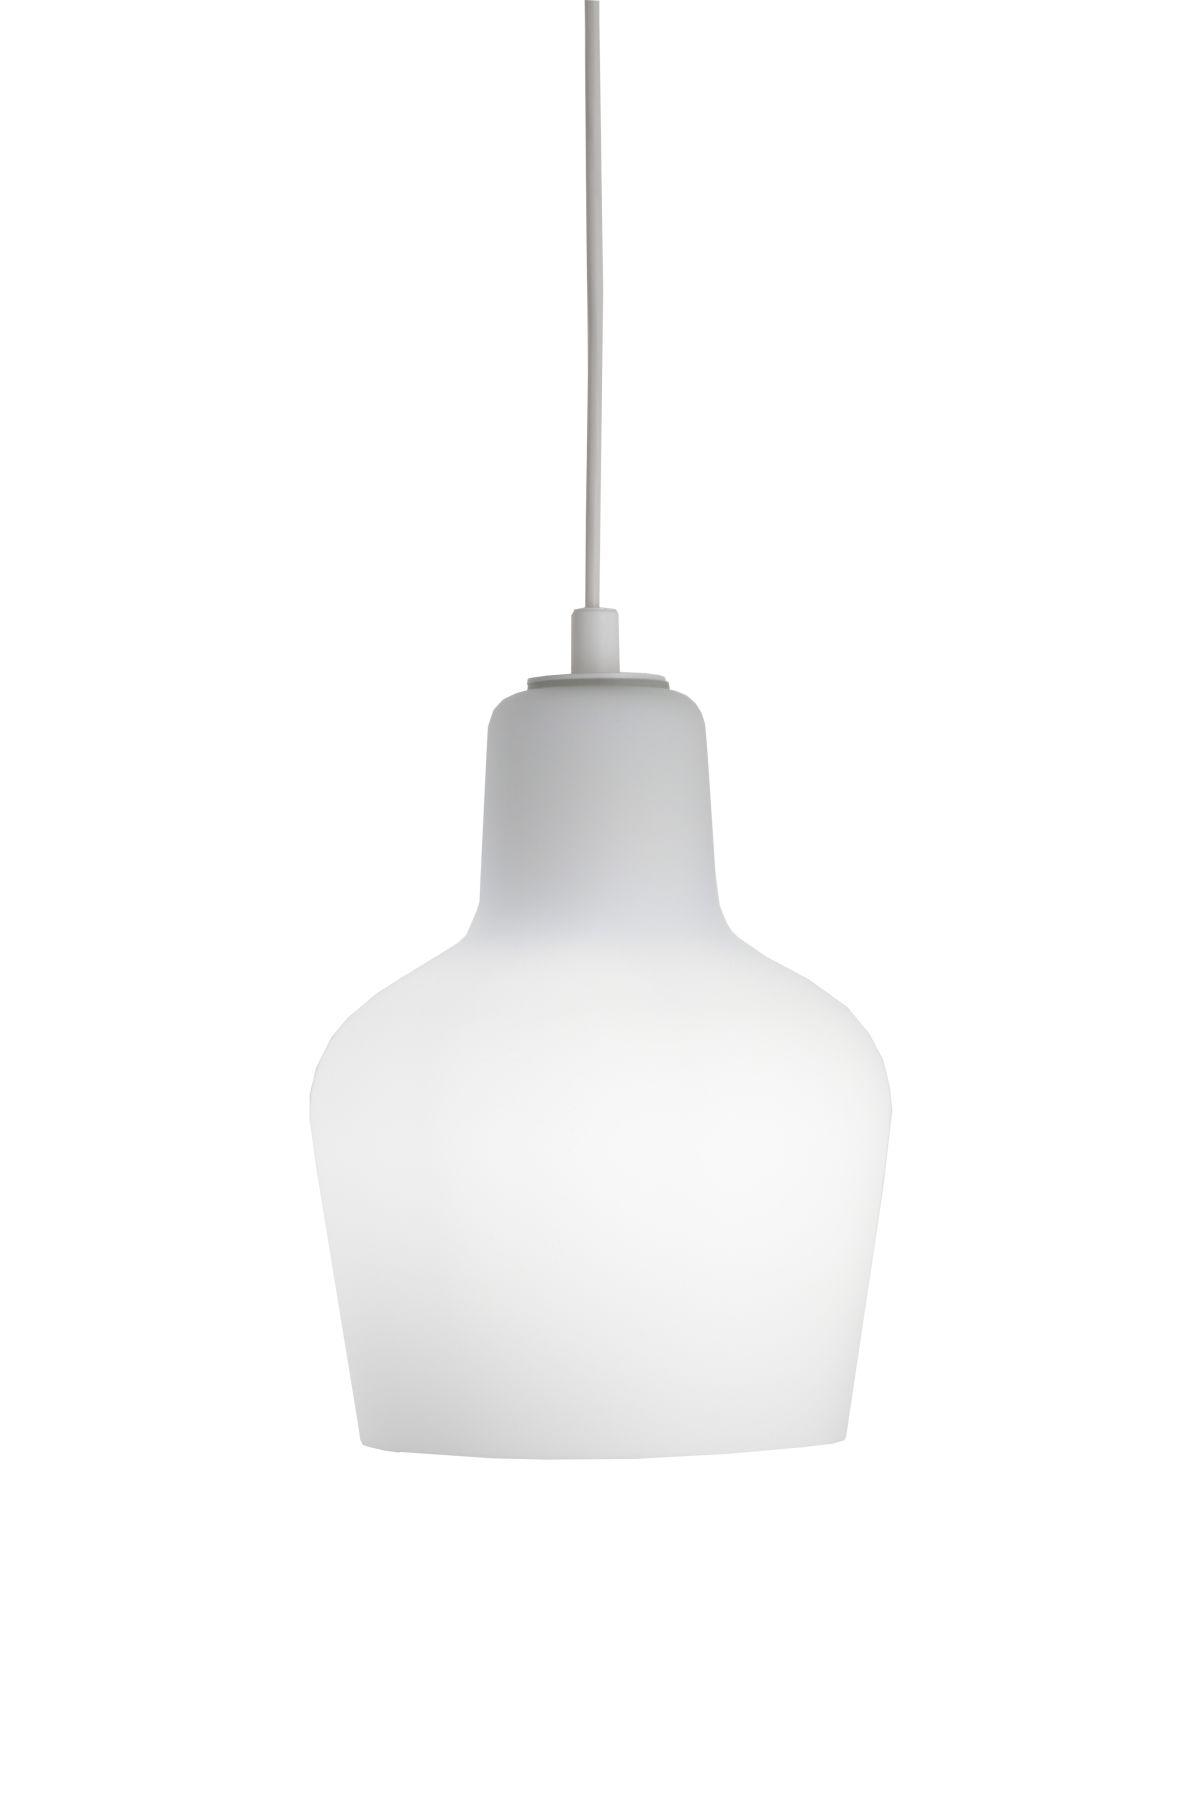 Pendant-Light-A440_On